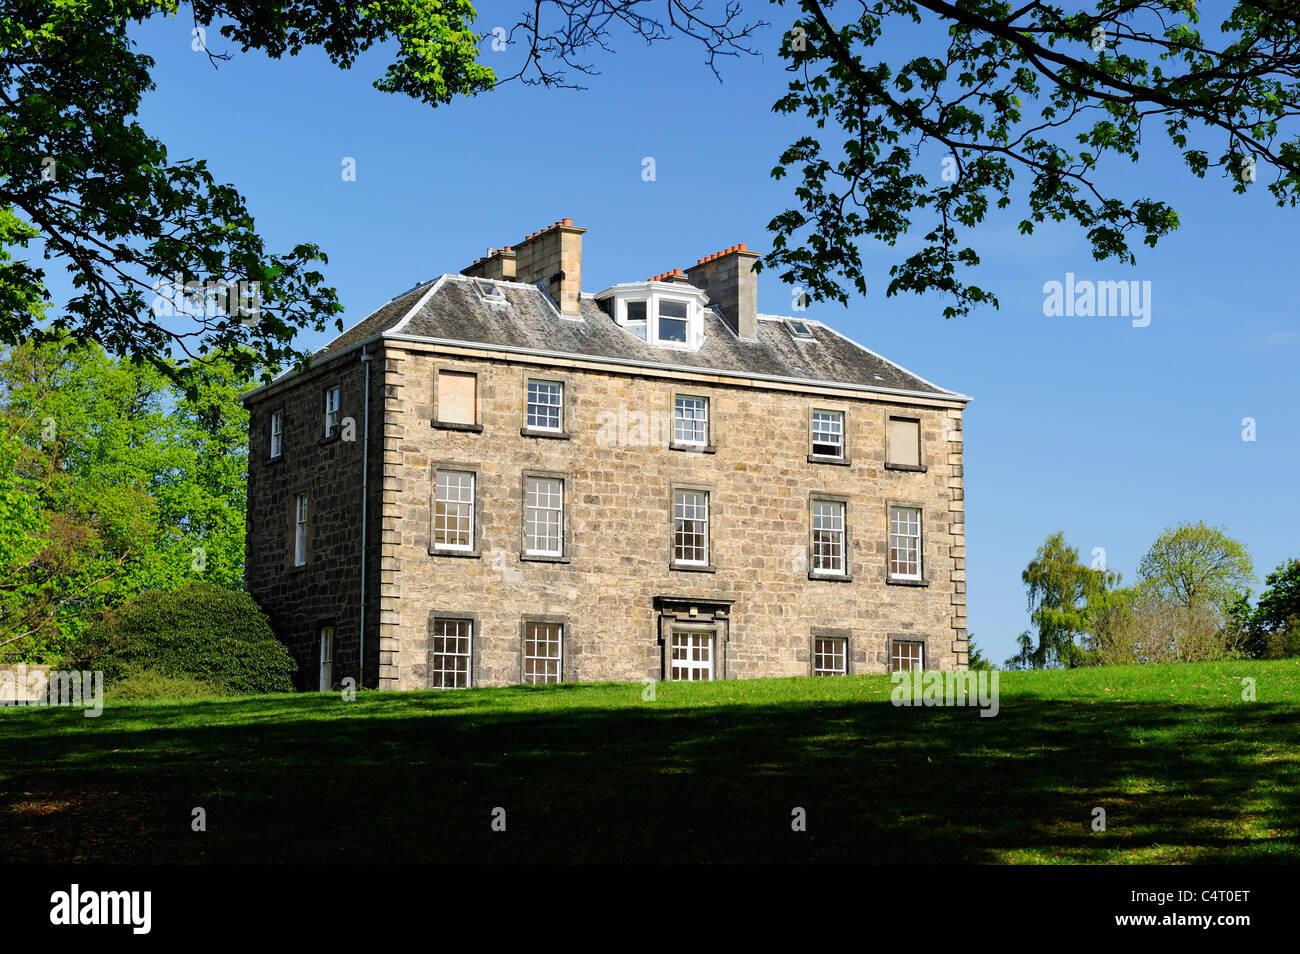 Inverleith House in the Royal Botanic Garden, Edinburgh, Scotland, UK - Stock Image